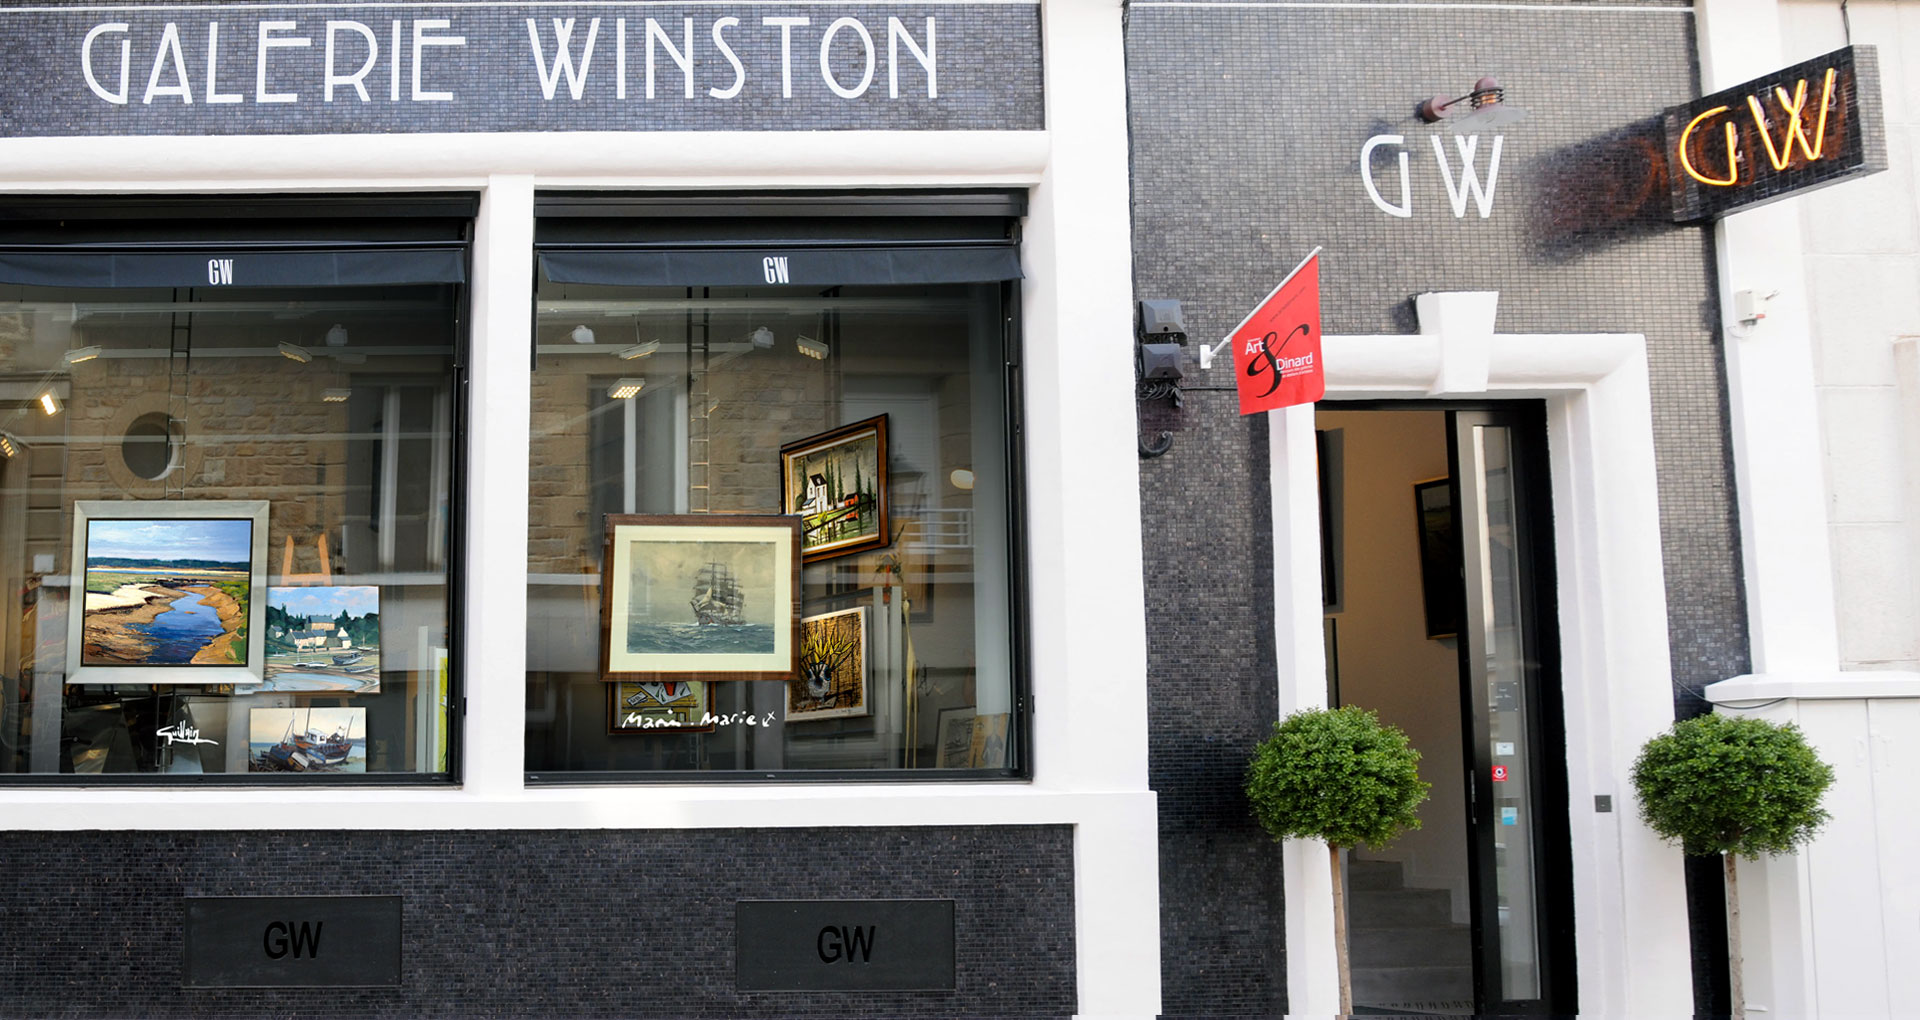 facade-galerie-winston